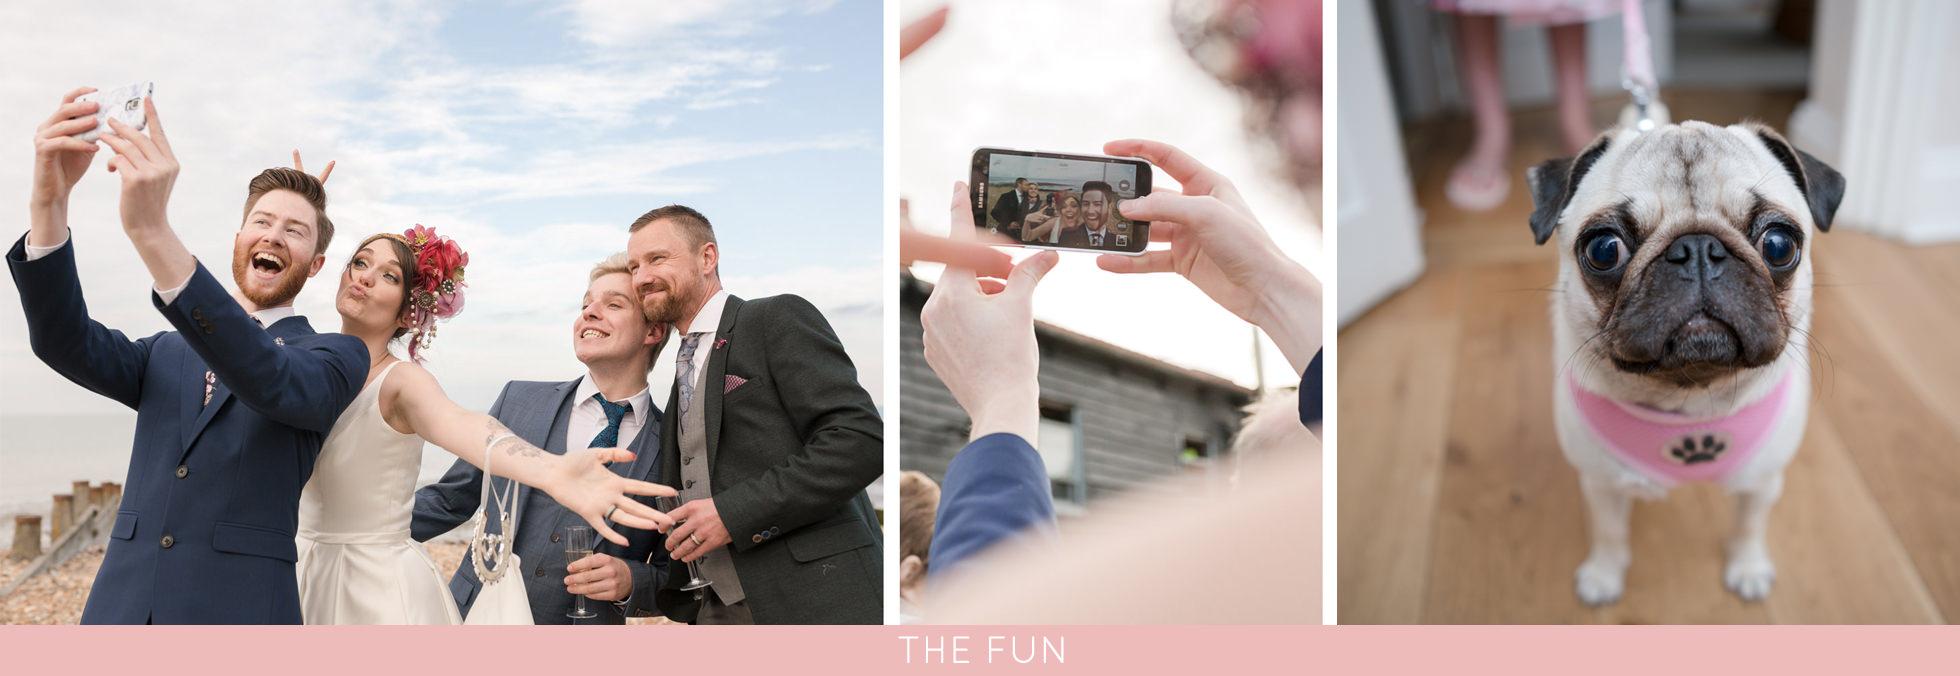 fun wedding in whitstable